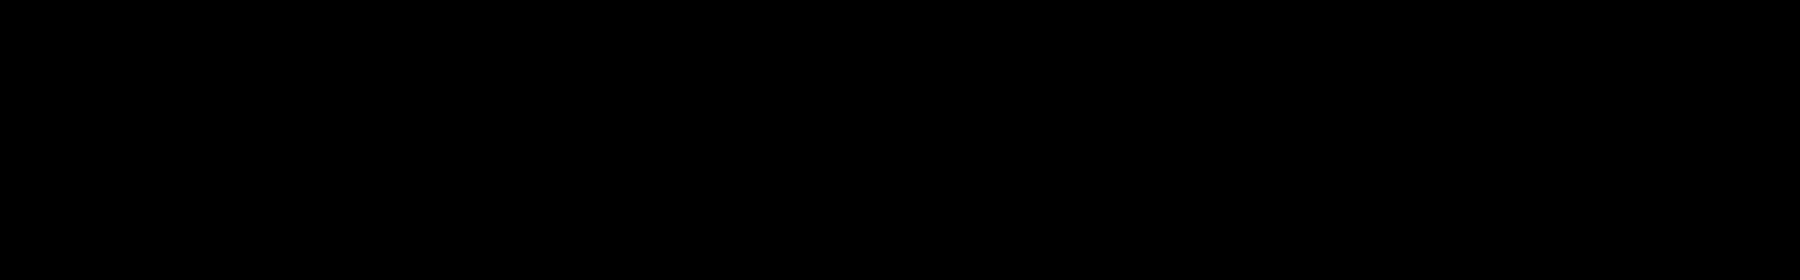 JACK audio waveform